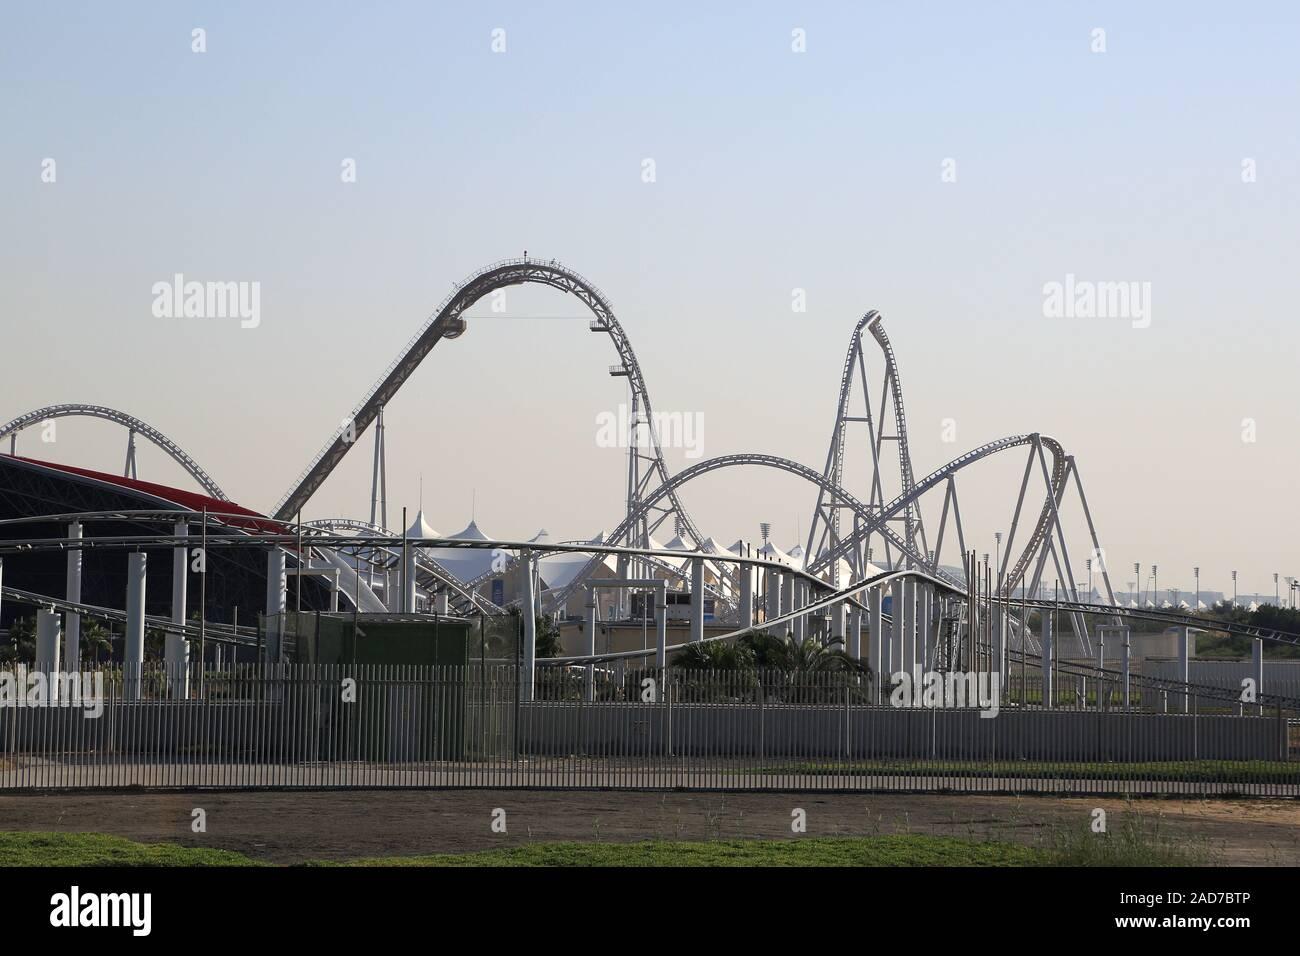 Abu Dhabi Formula Rossa Roller Coaster At Ferrari World Stock Photo Alamy